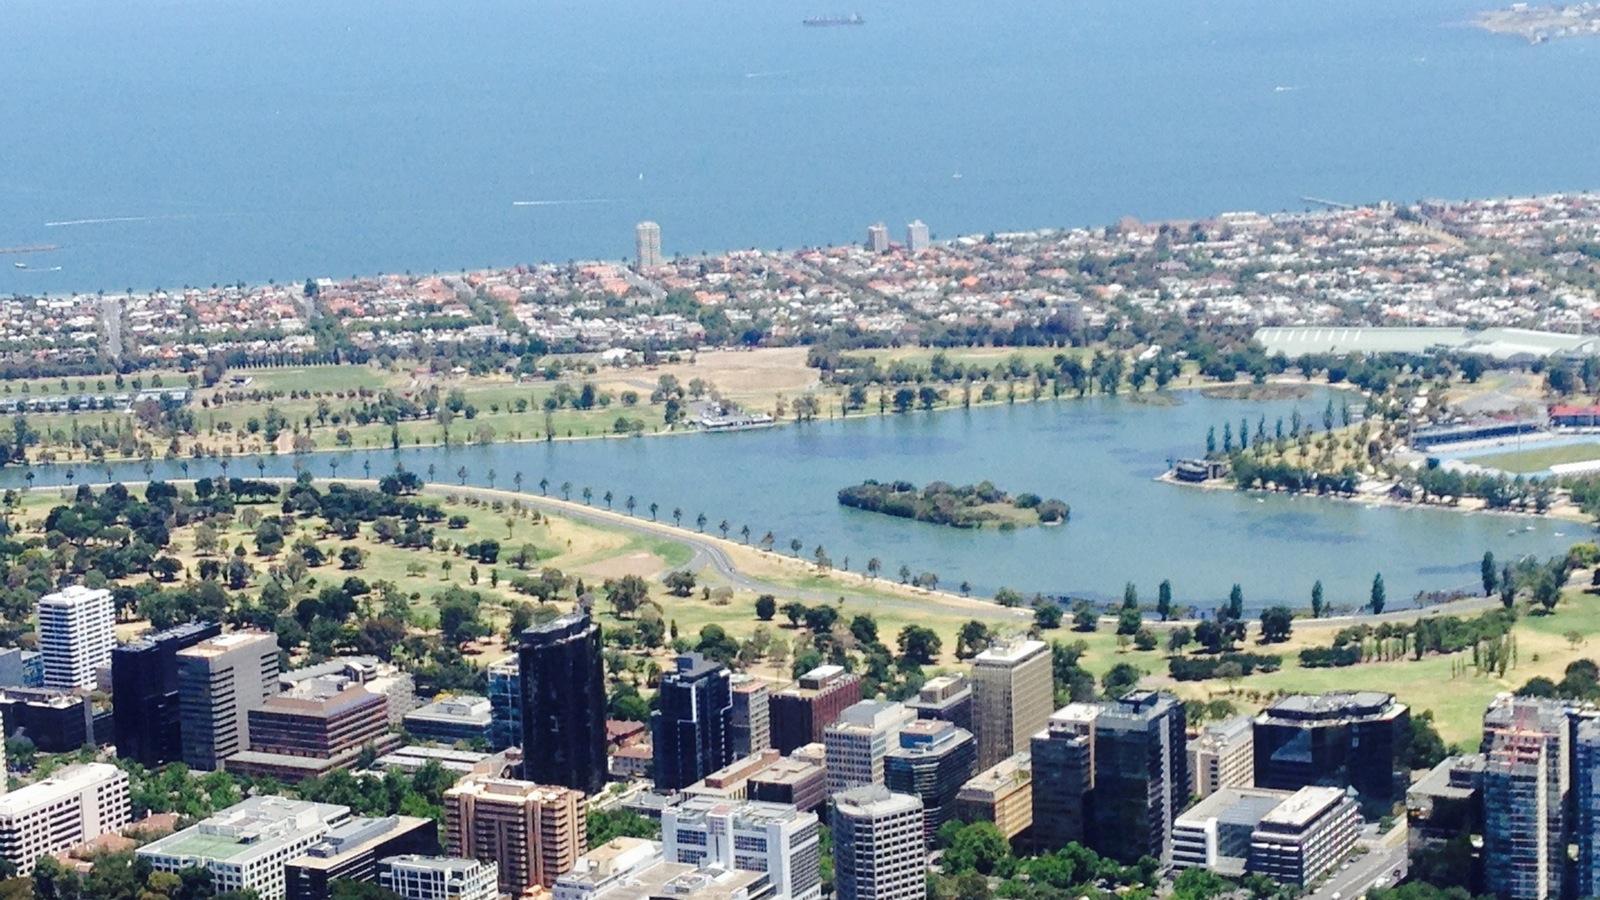 Port Phillip Bay/Albert Park